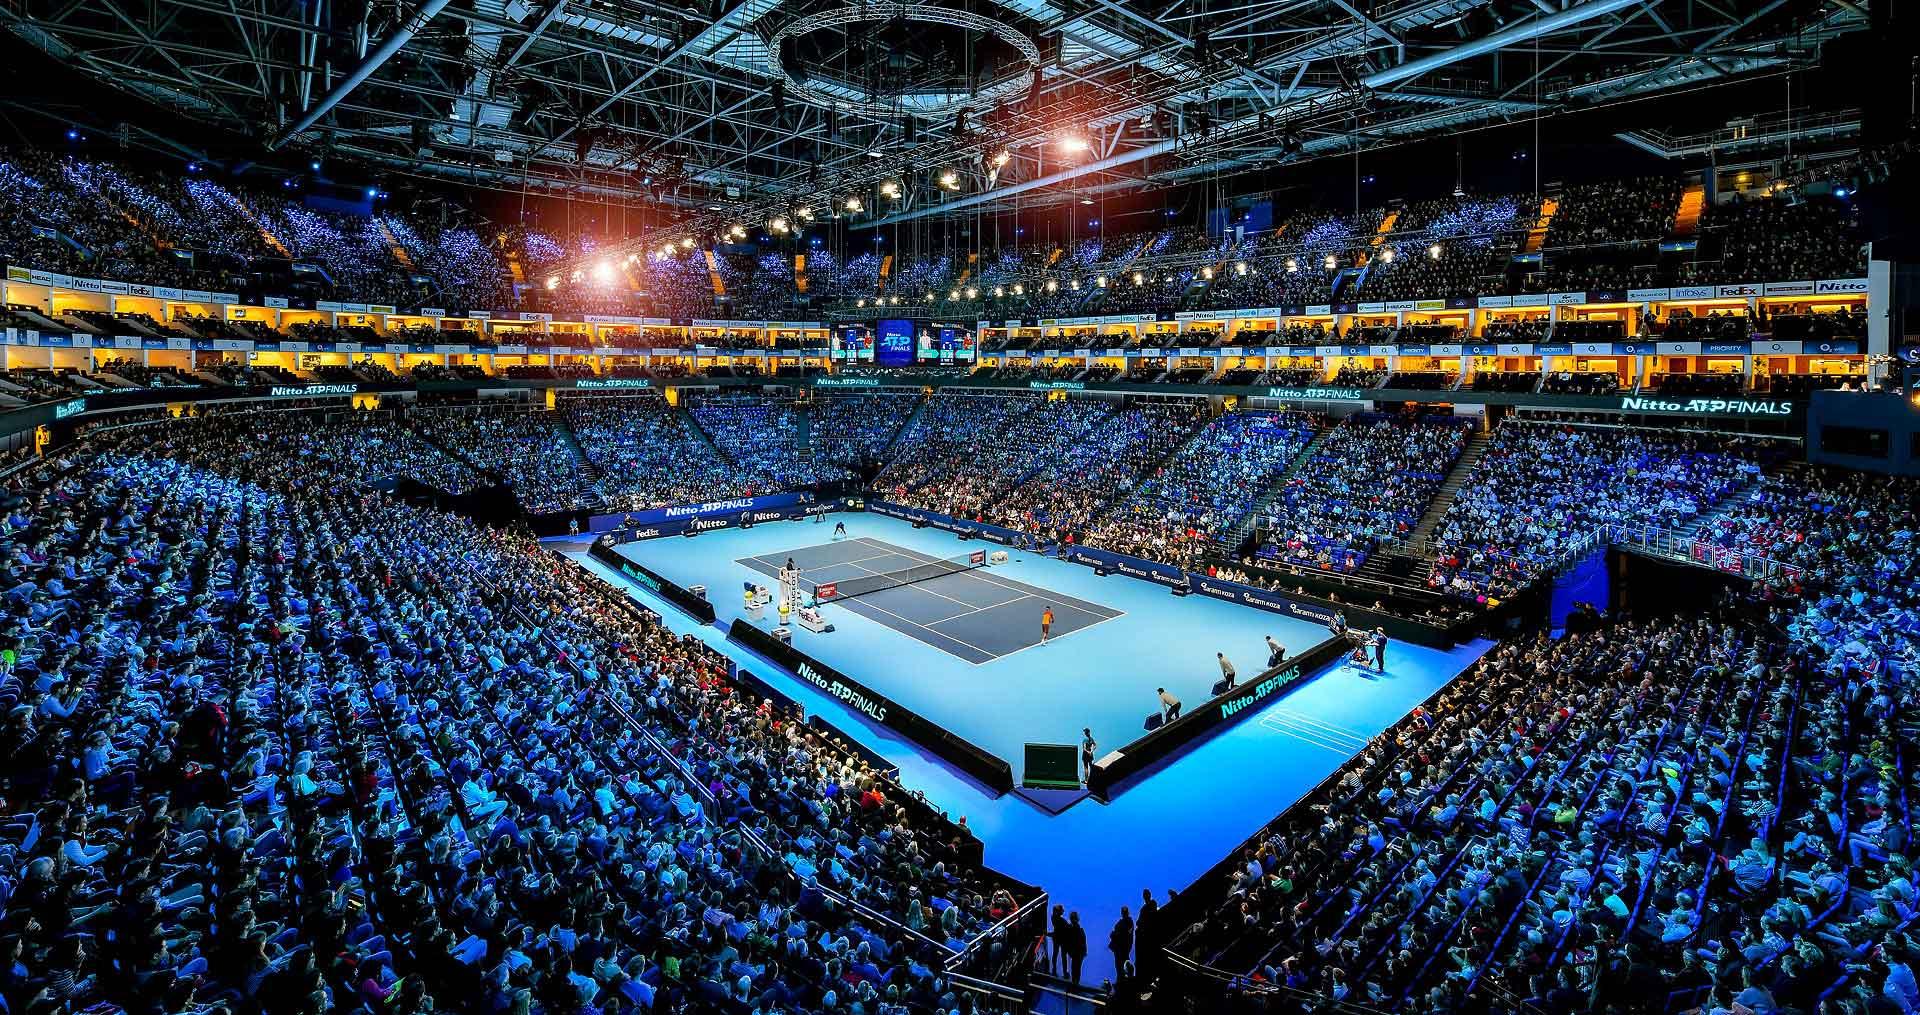 Nitto Atp Finals Overview Atp Tour Tennis